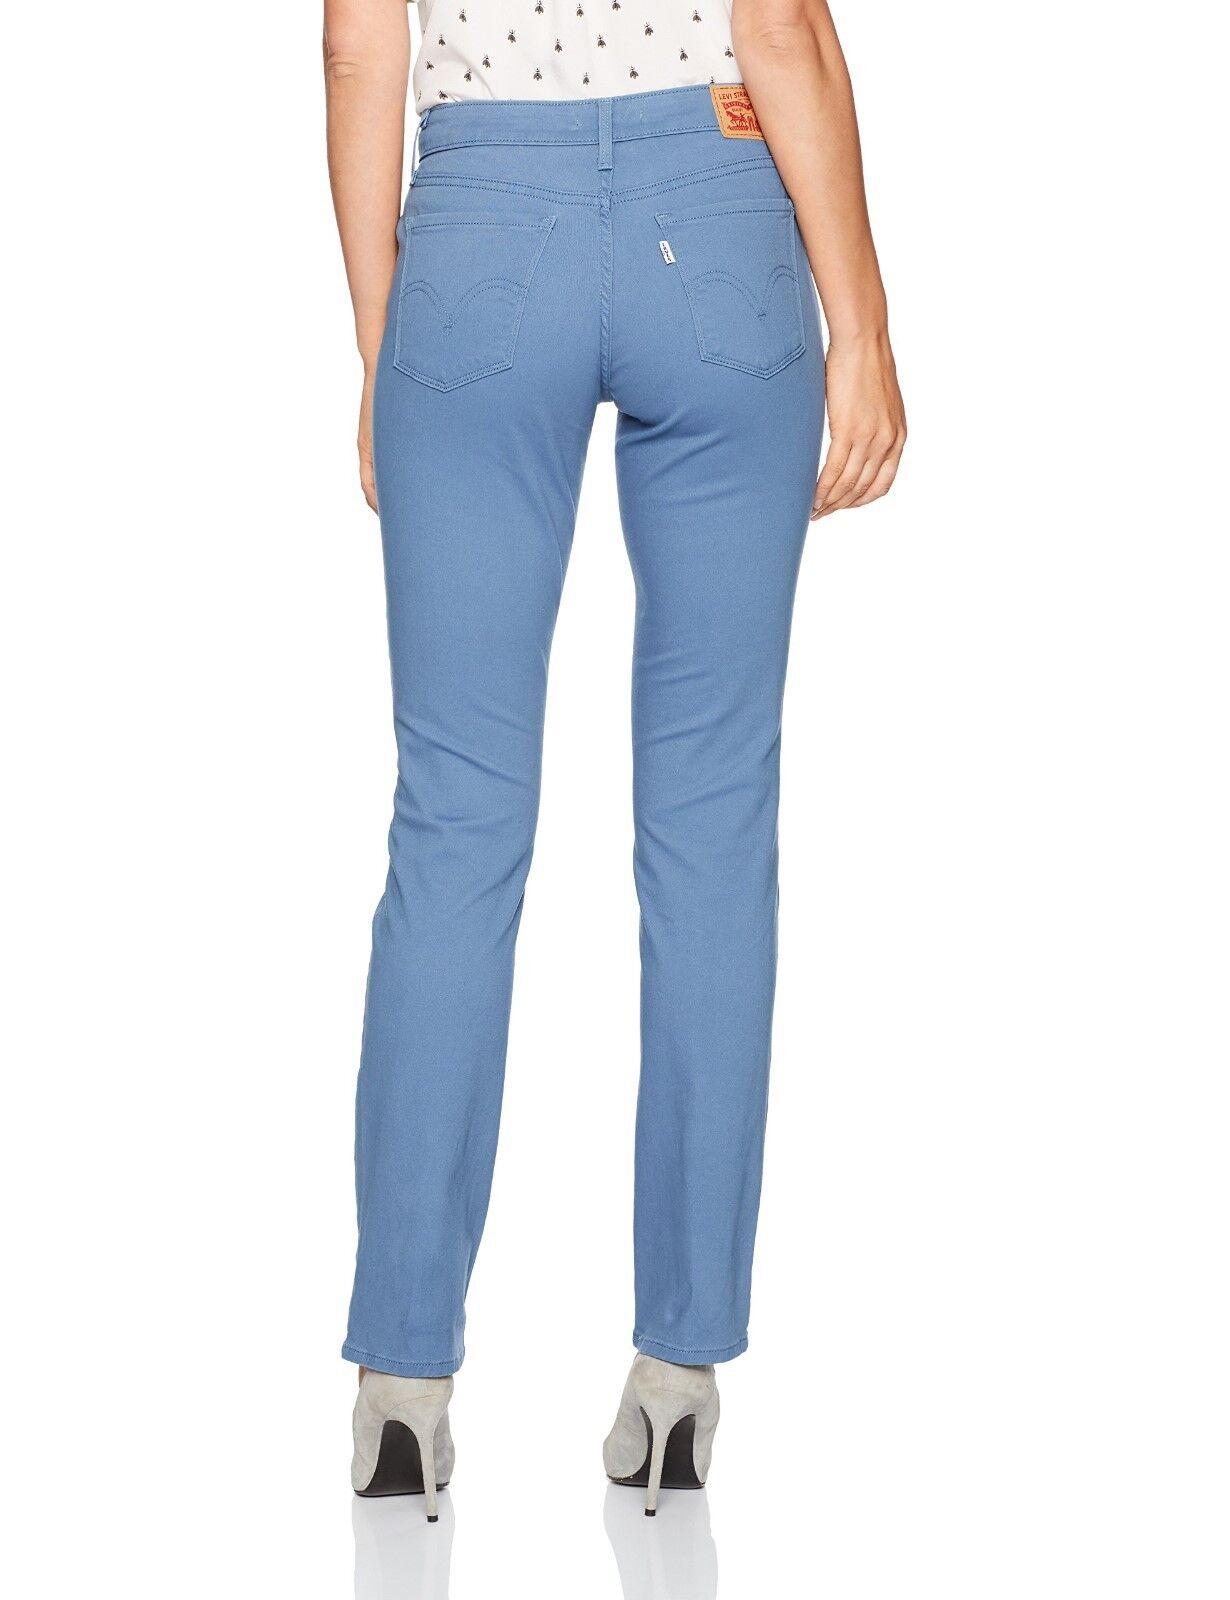 d3714b942 Levi s Womens 505 Straight Leg Jeans 32x32 Soft Sunset Blue for sale ...